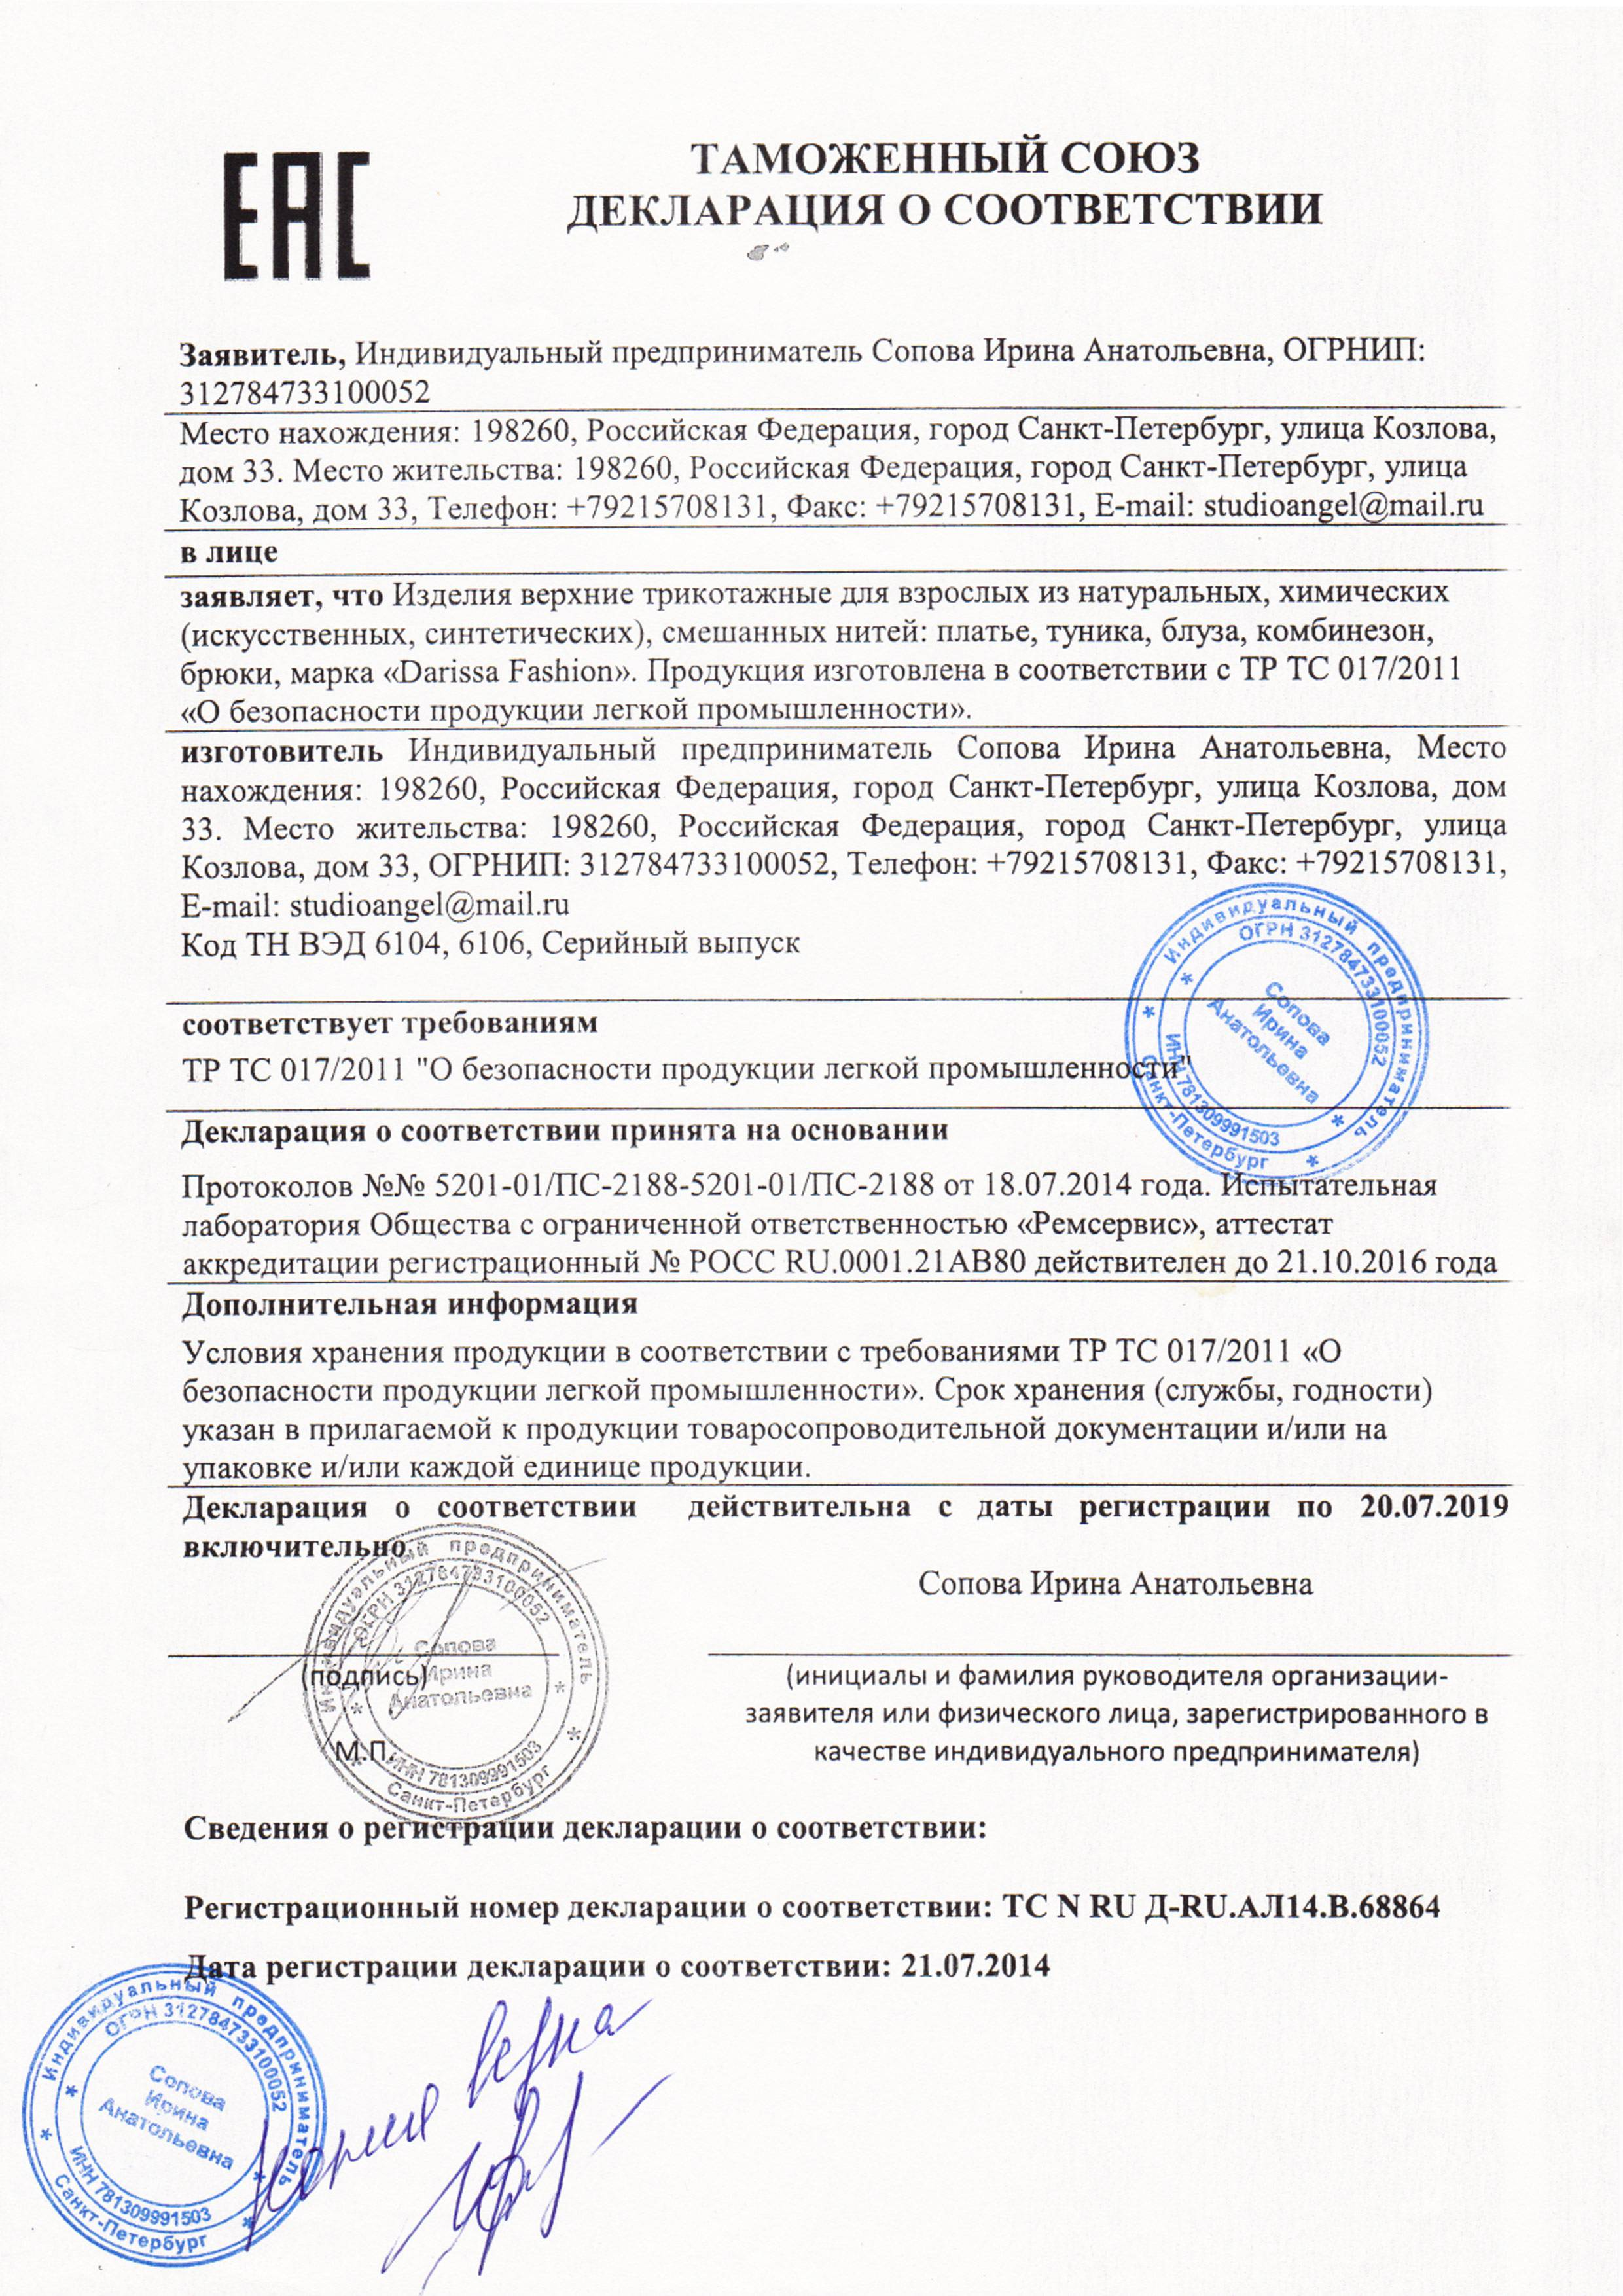 sertifikat-darissa